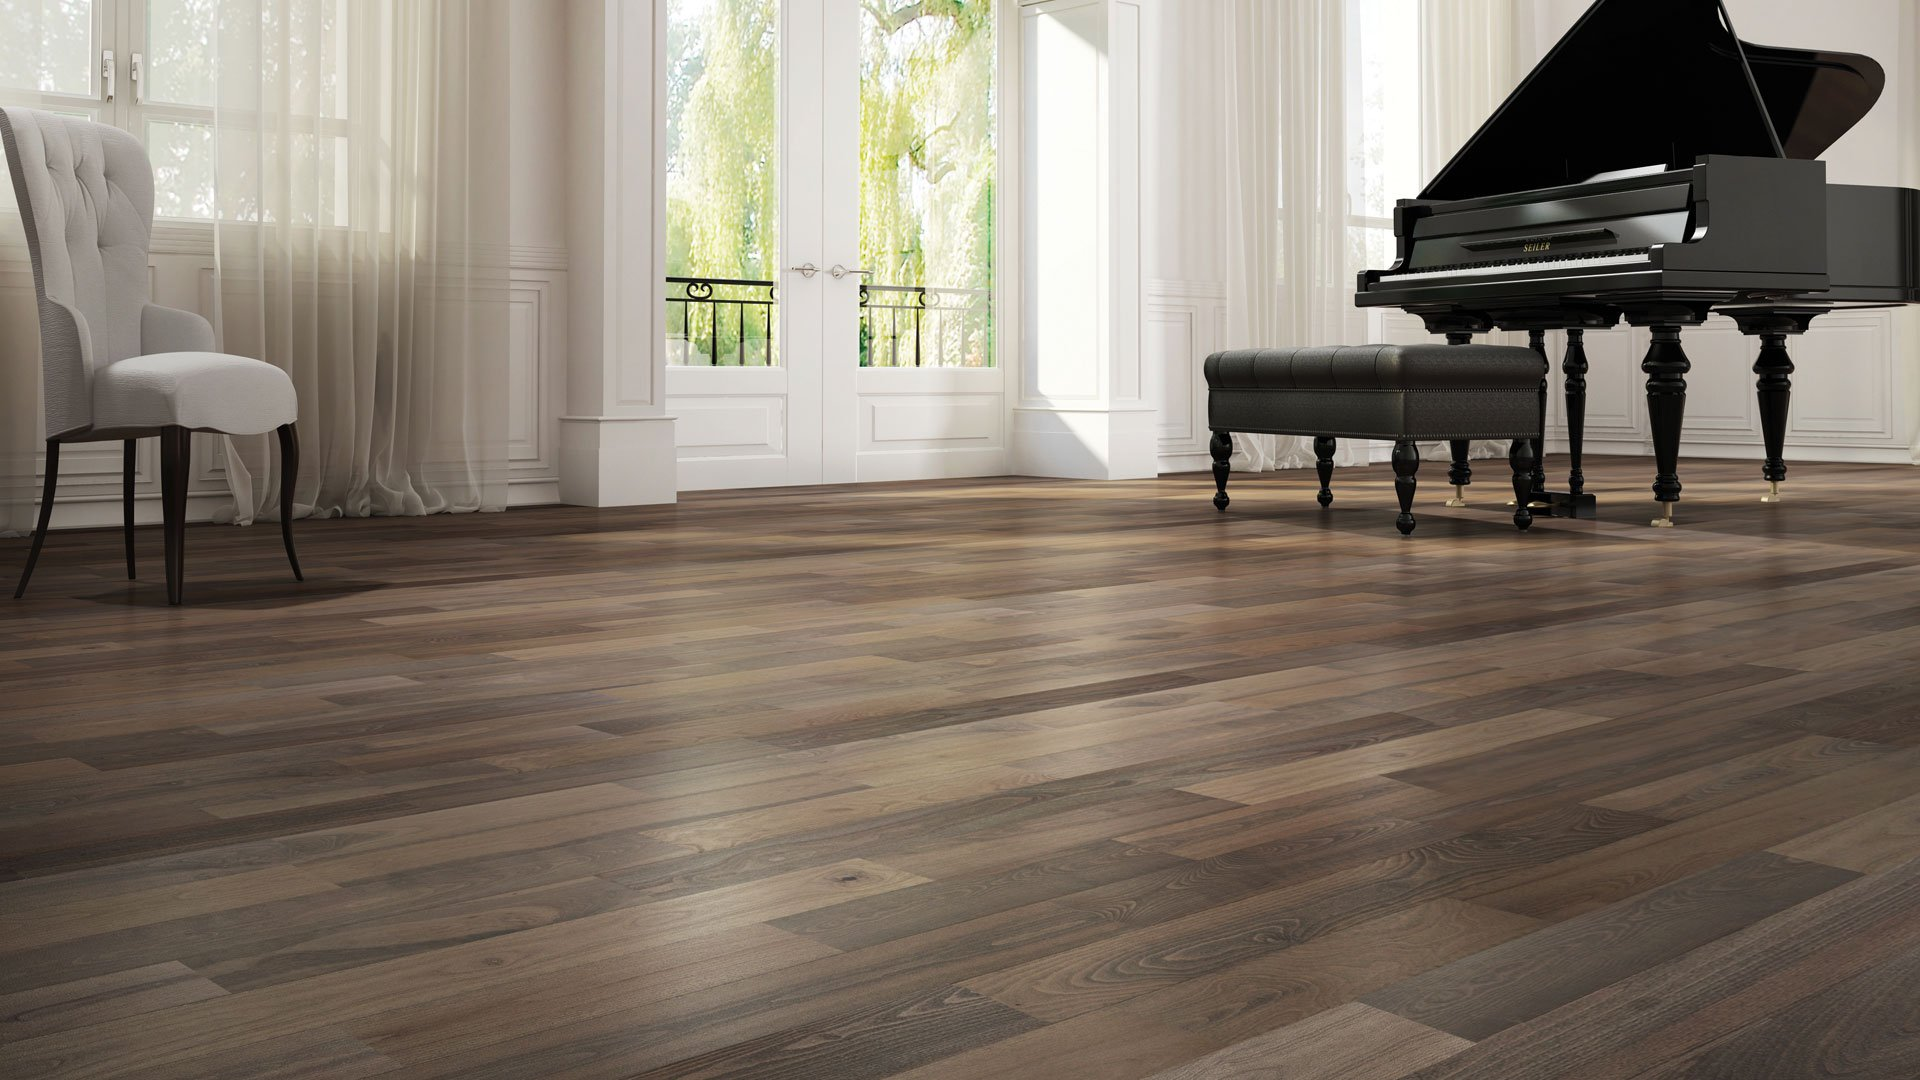 Hardwood Plank Flooring